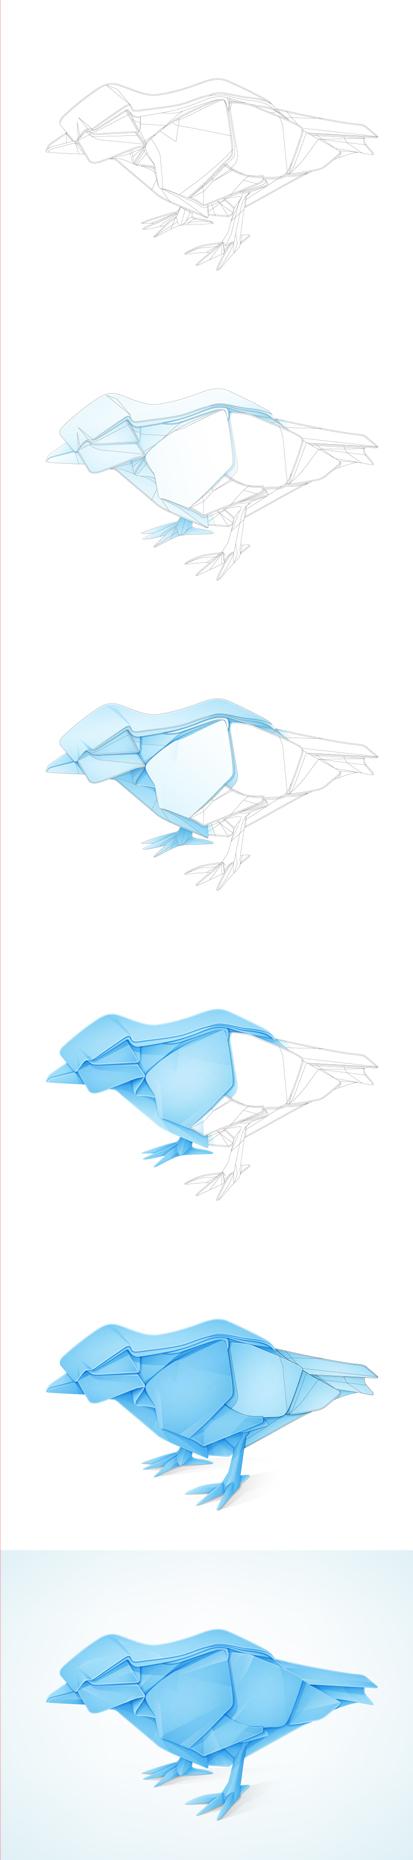 Twitterbirdprocess